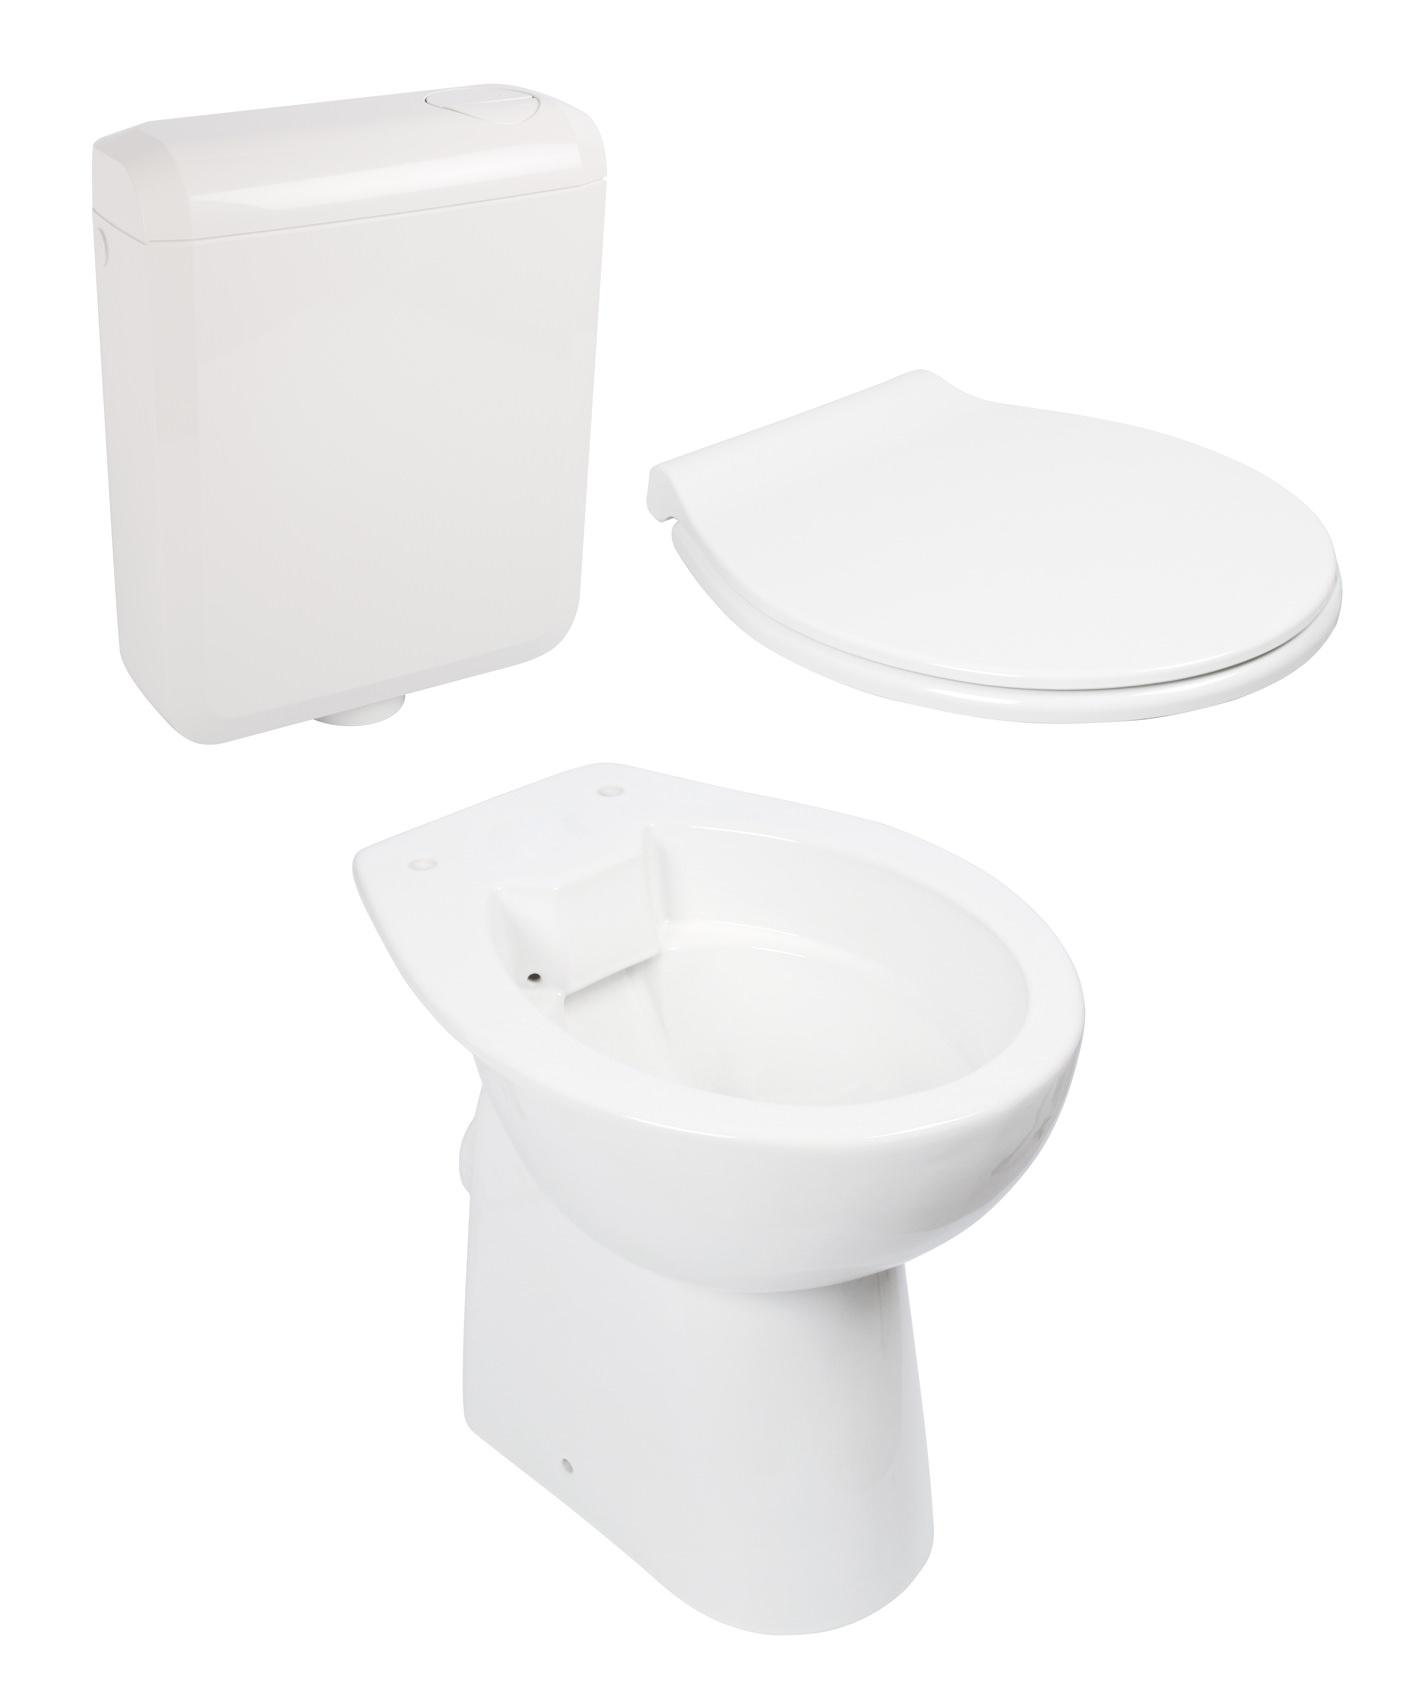 Sehr Spülrandloses WC im Keramik-Set 99000187 | www.calmwaters.de GY15